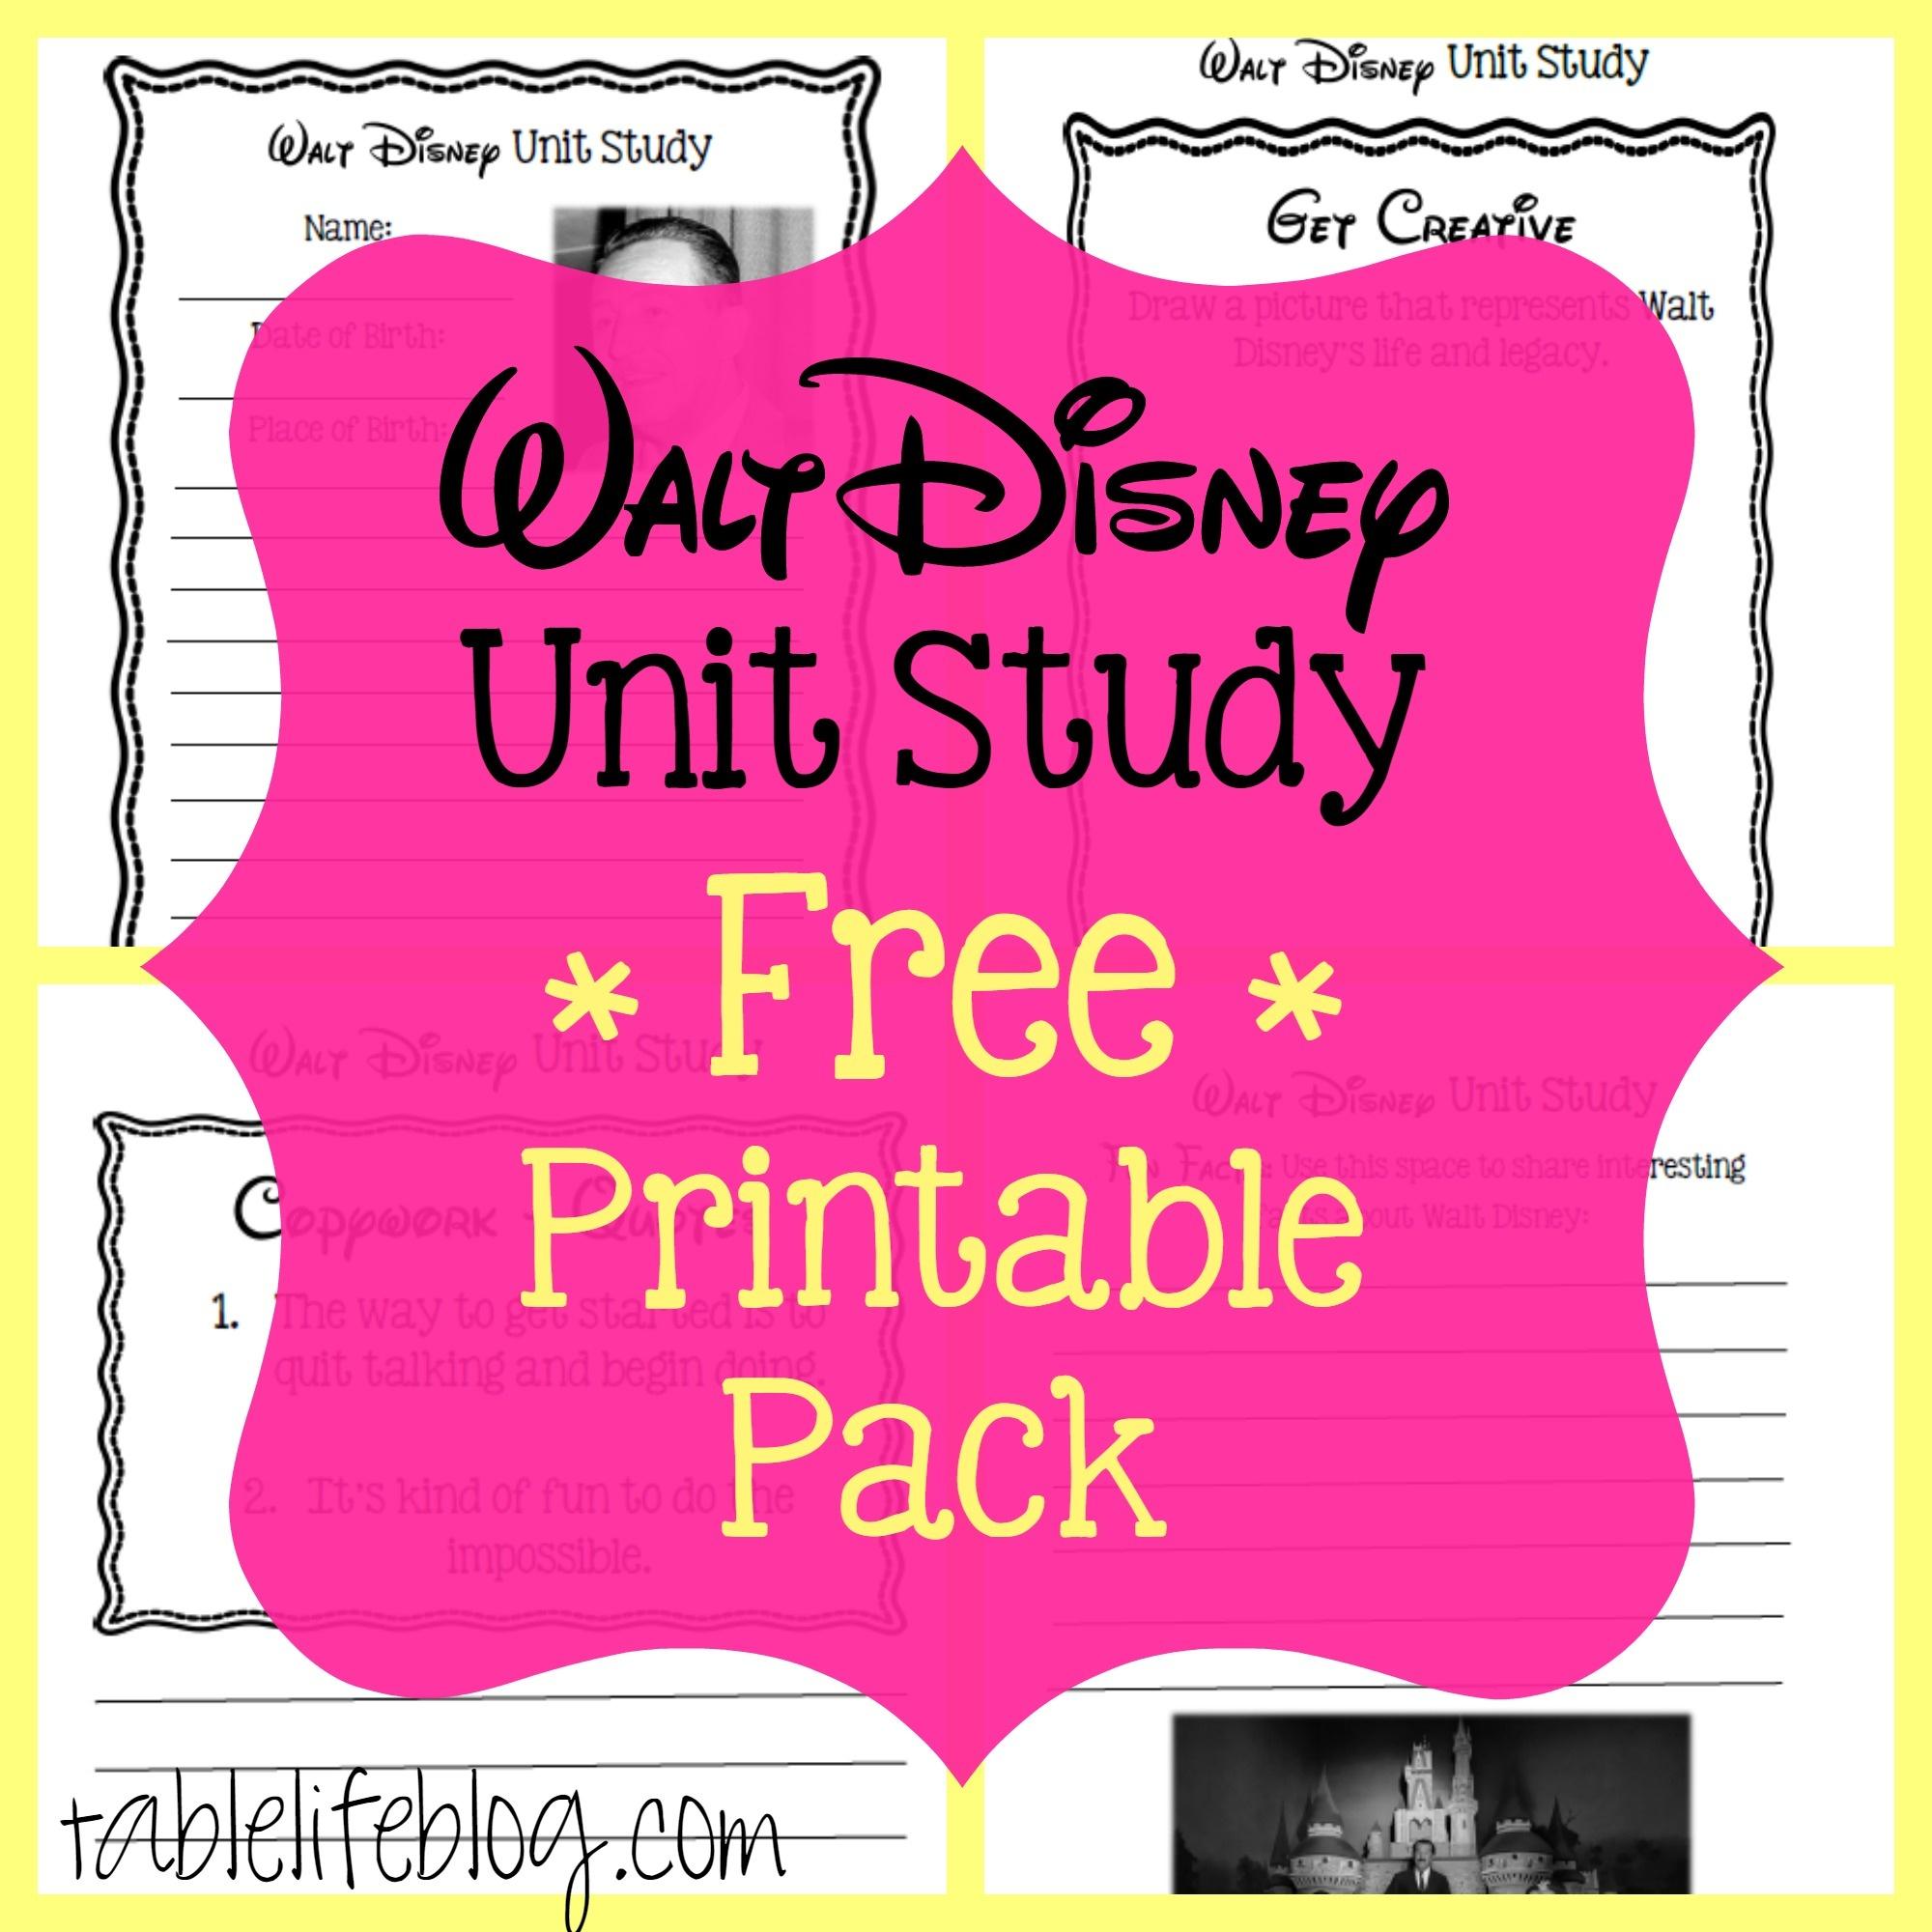 Walt Disney Unit Study (With Free Printable!) • Tablelifeblog - Free Printable Disney Stories